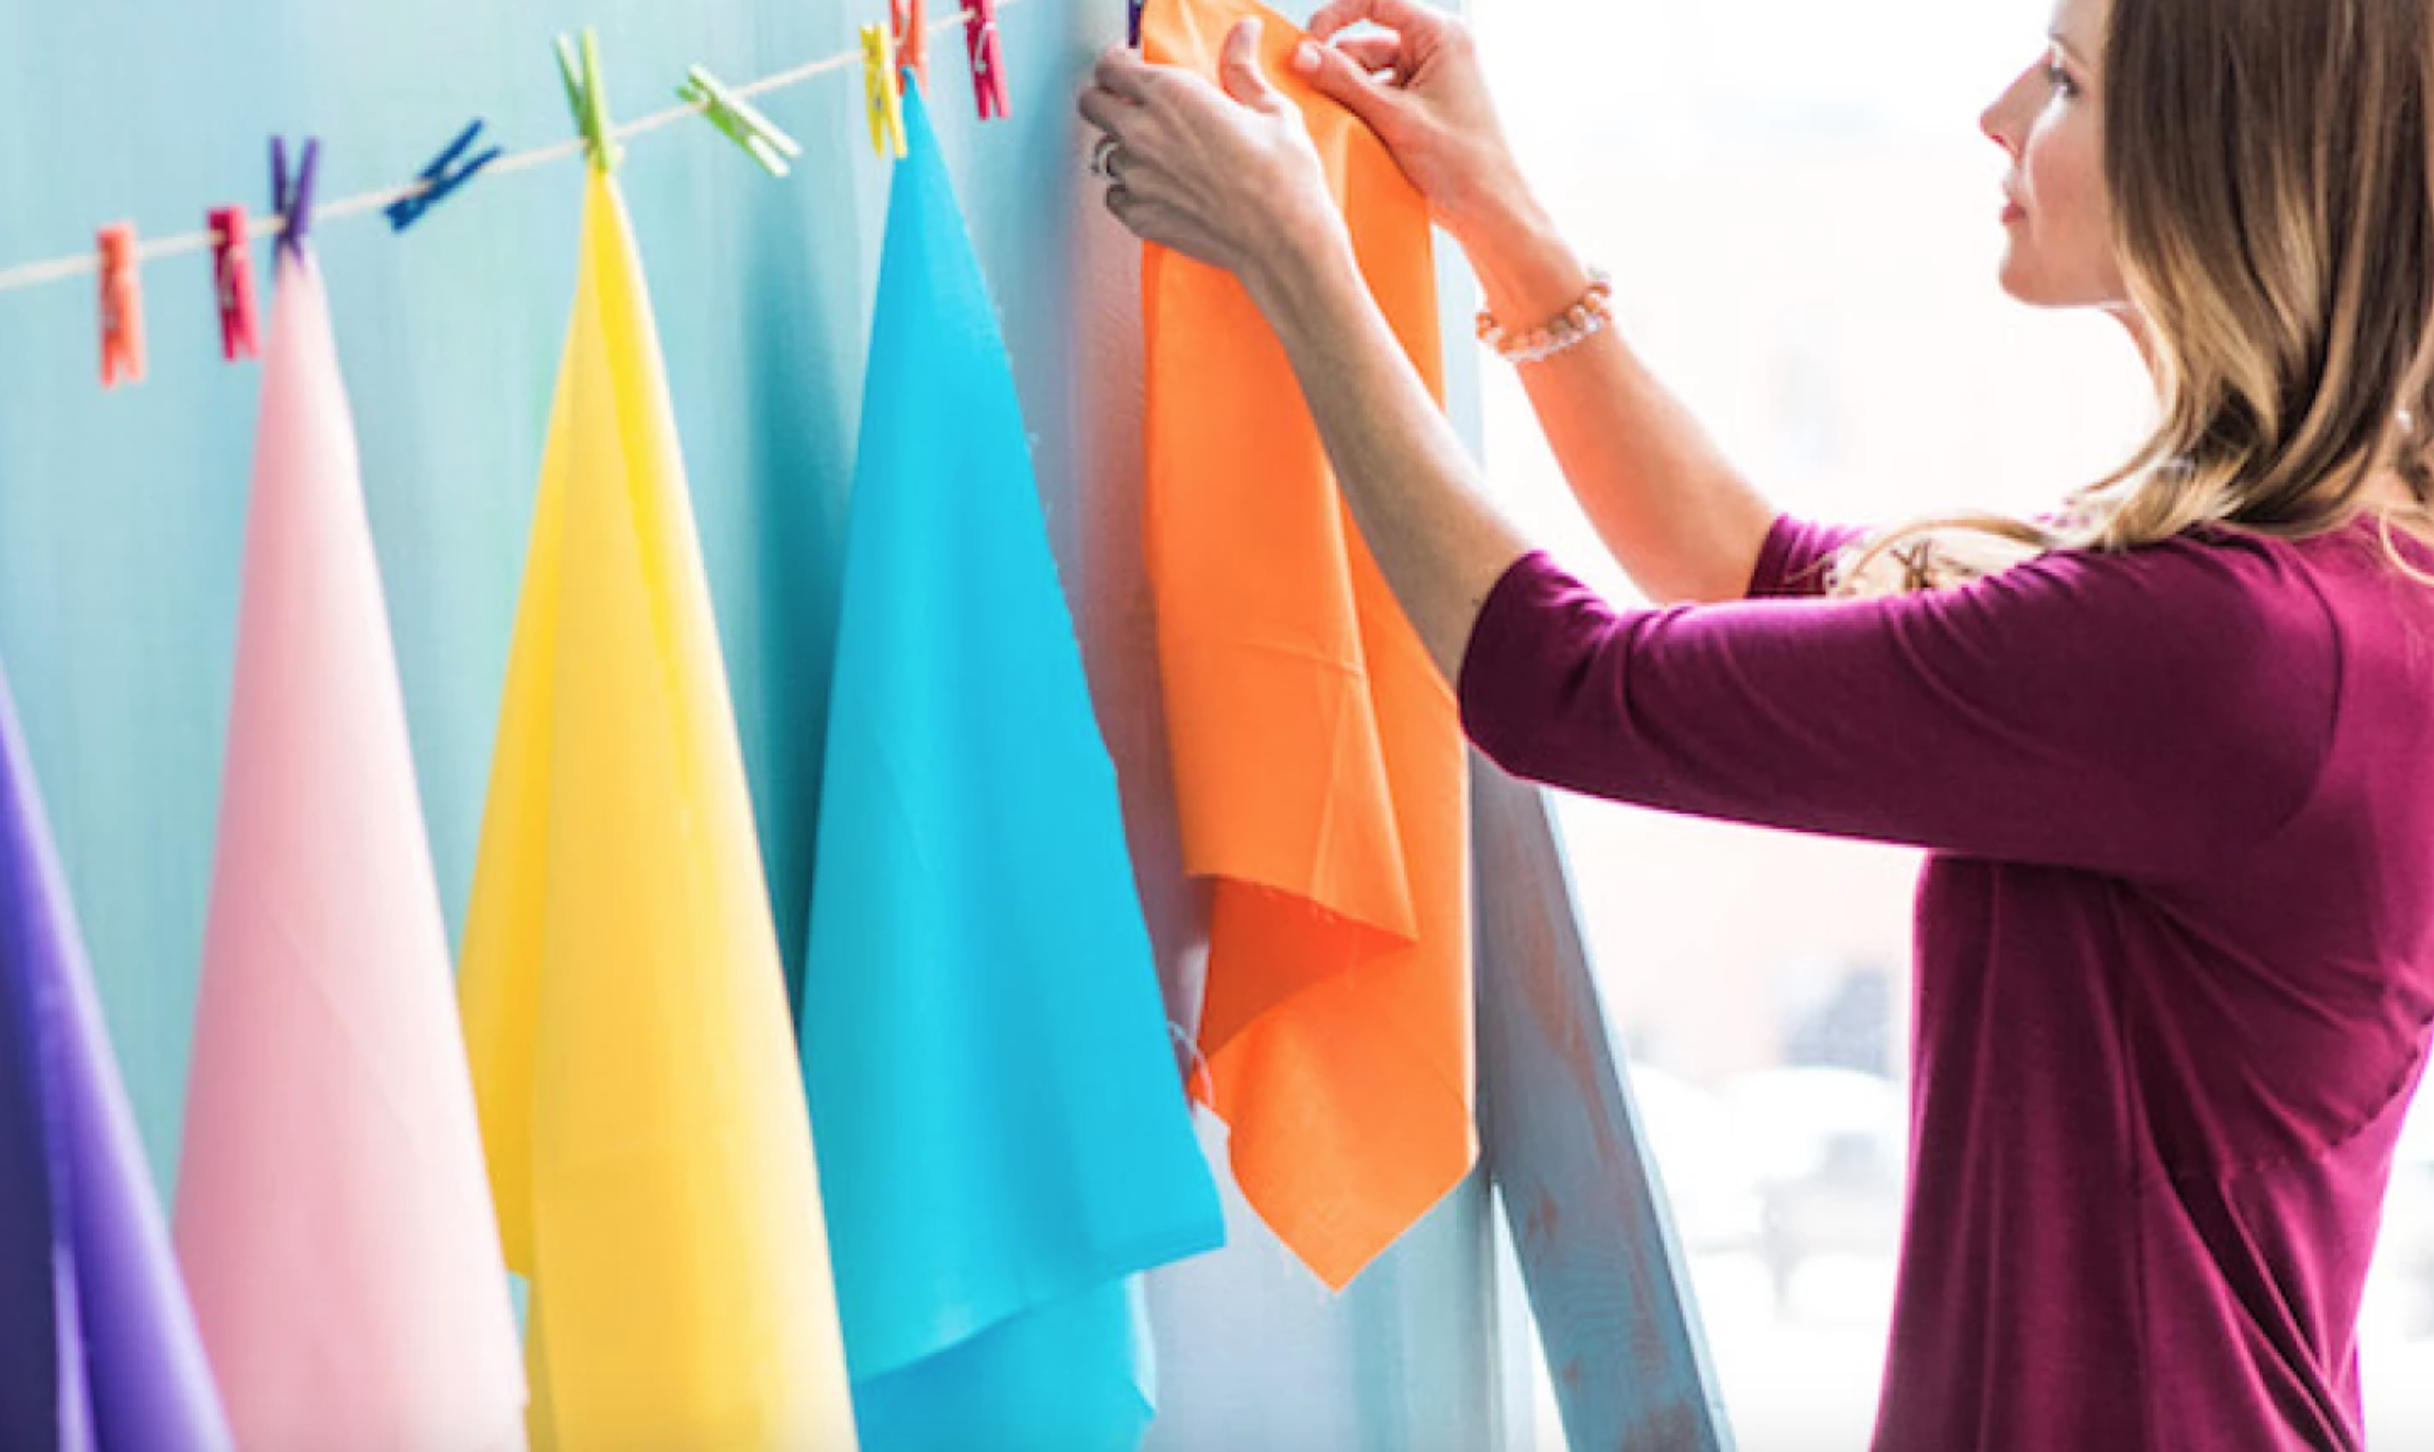 woman drying fabric